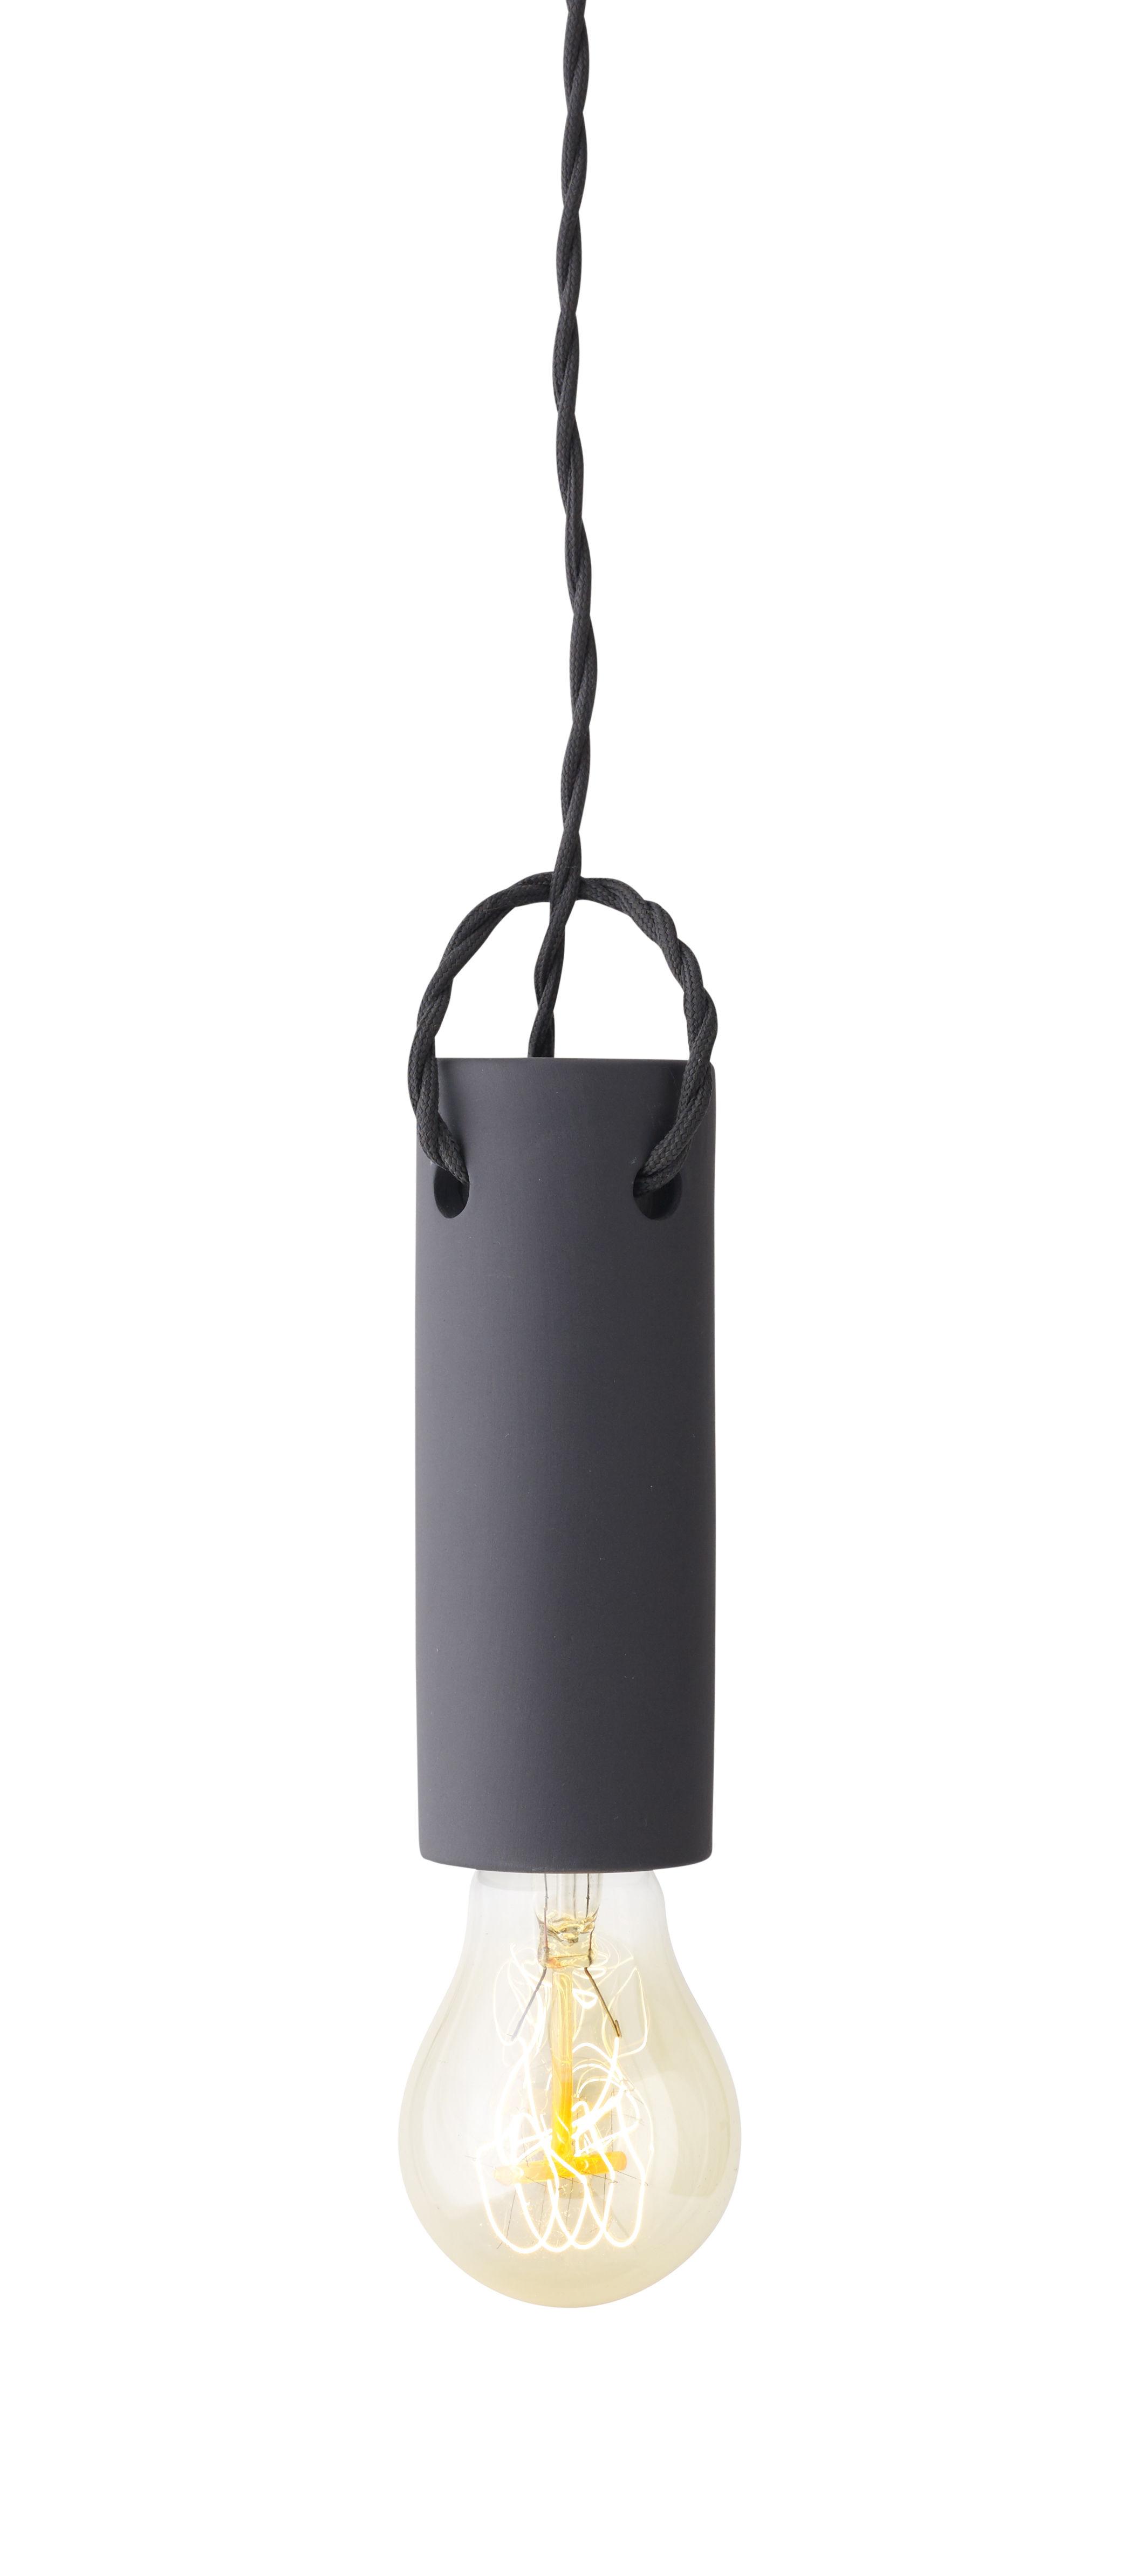 Luminaire - Suspensions - Suspension Tied / Céramique et câble textile - H 13 cm - Menu - Carbone - Céramique, Tissu